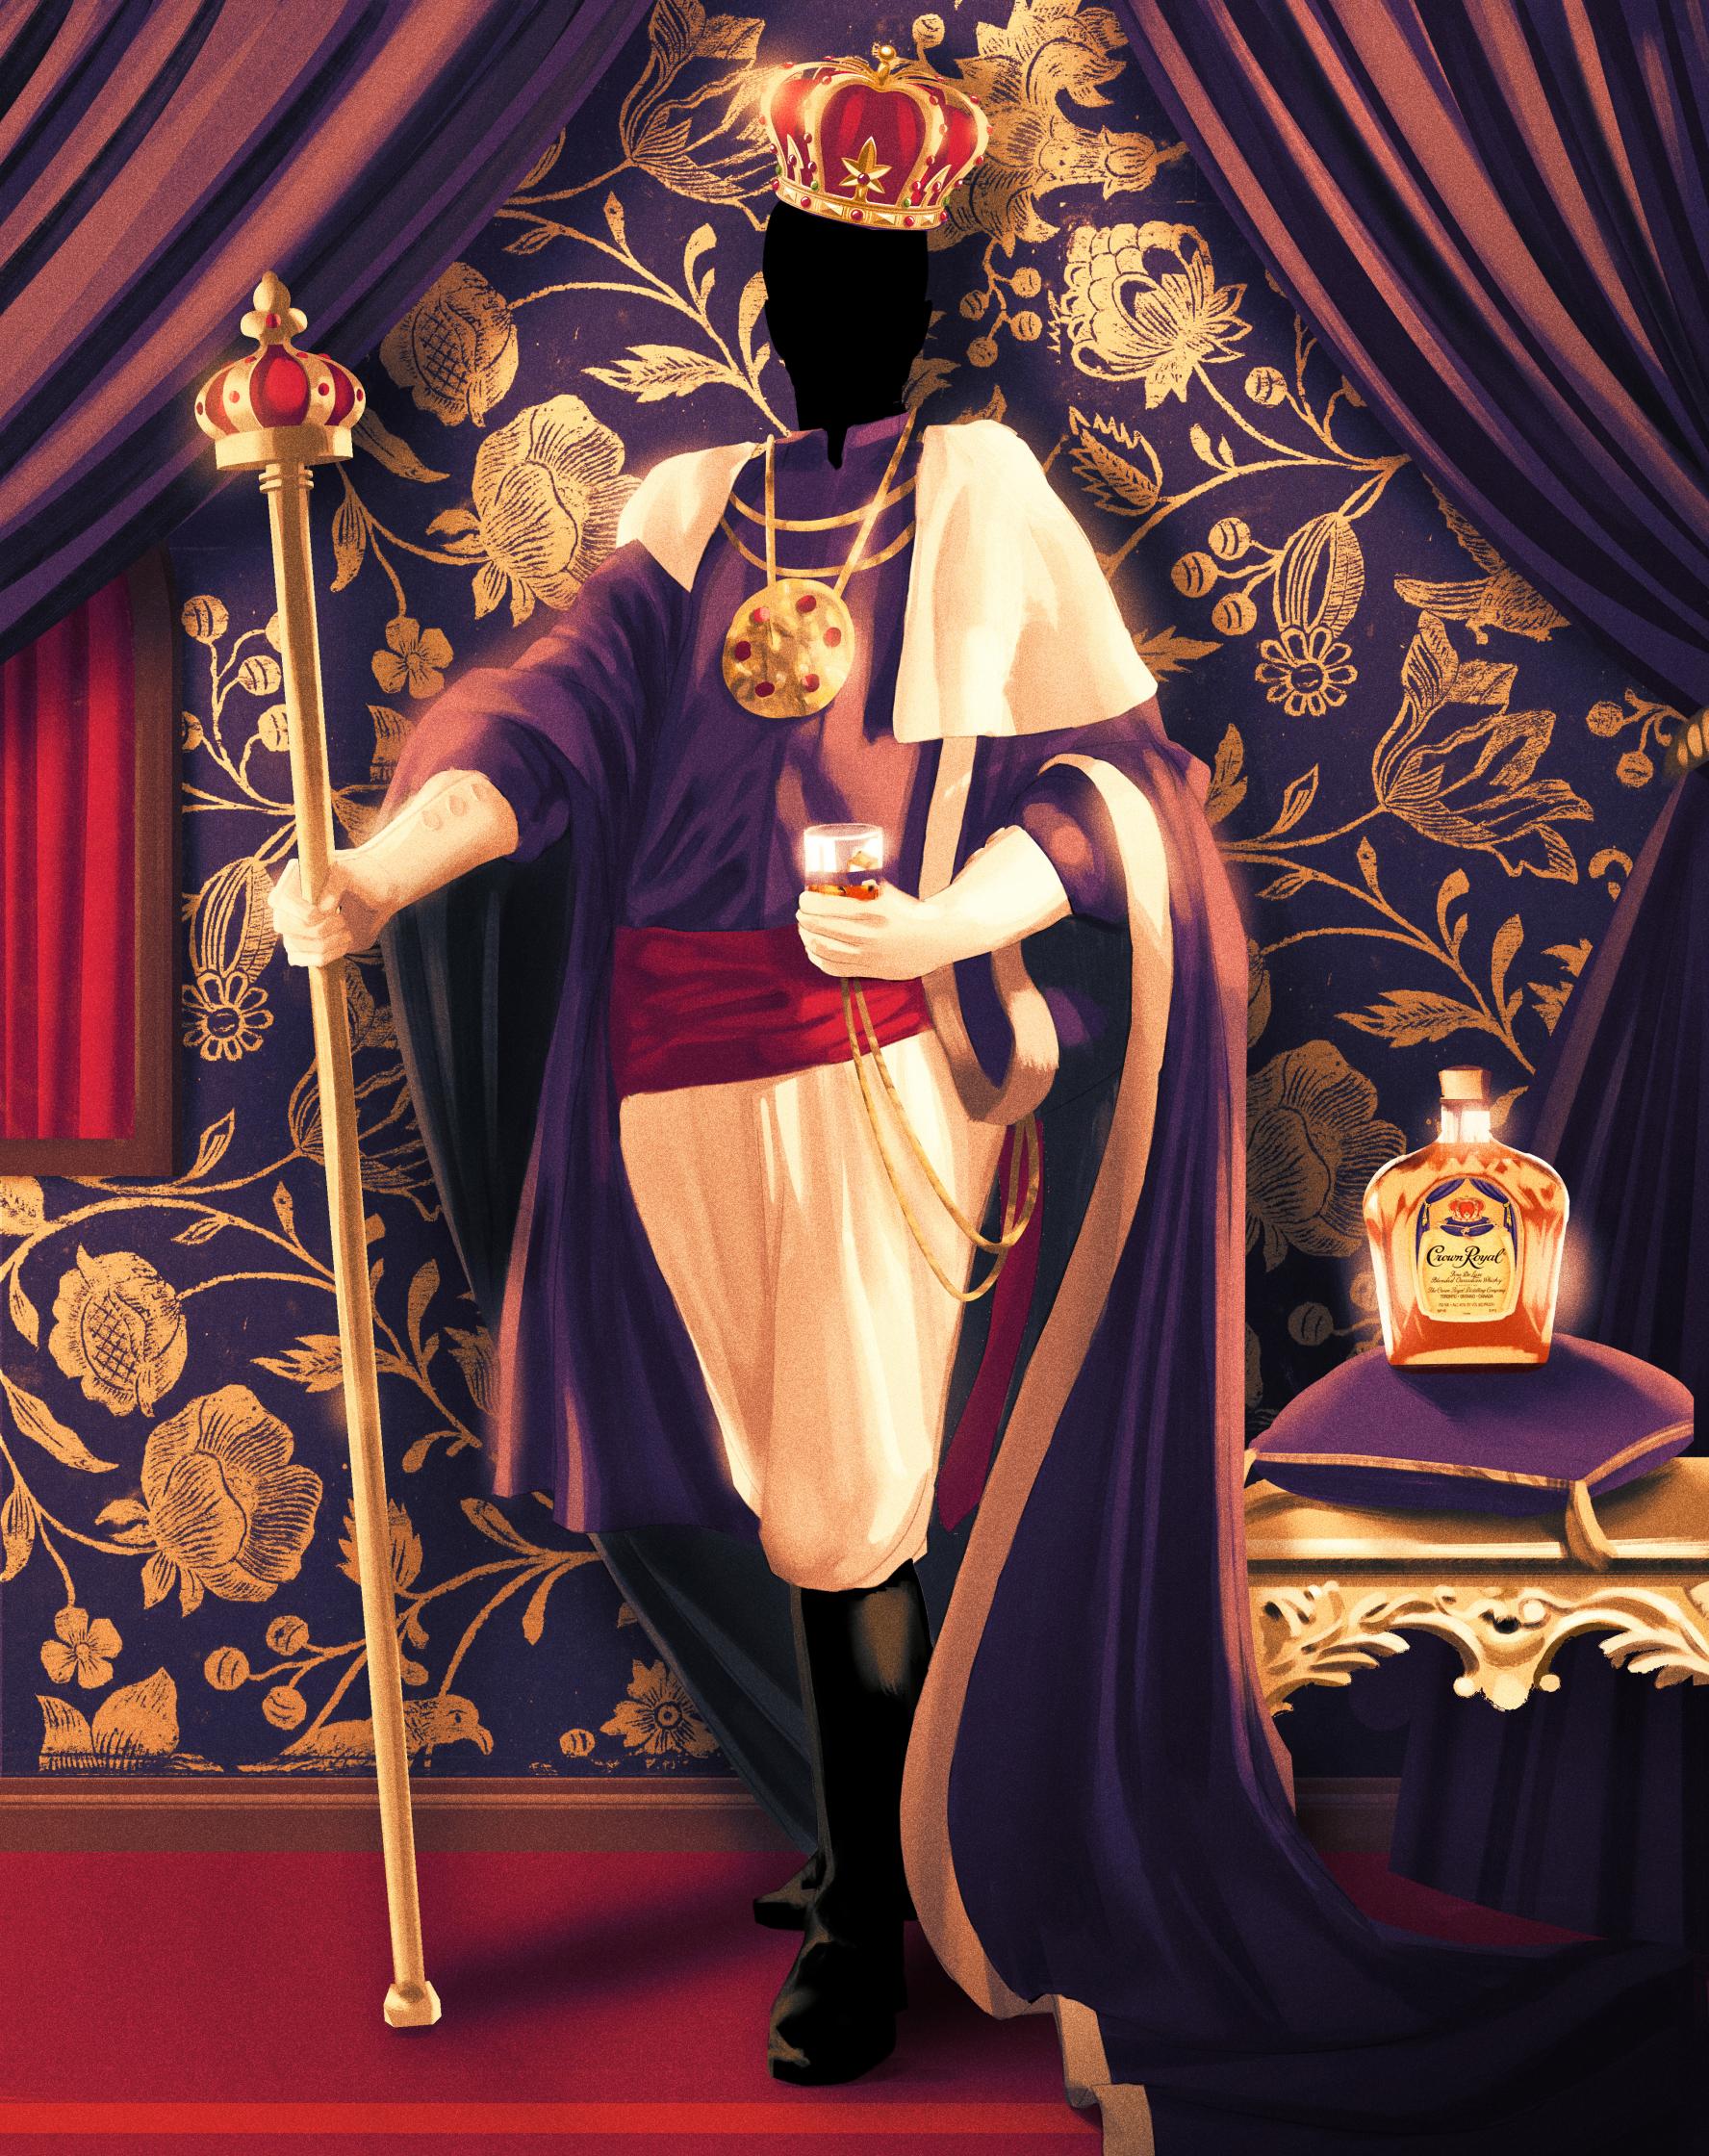 ul07_crown_royal_fathers_day.jpg